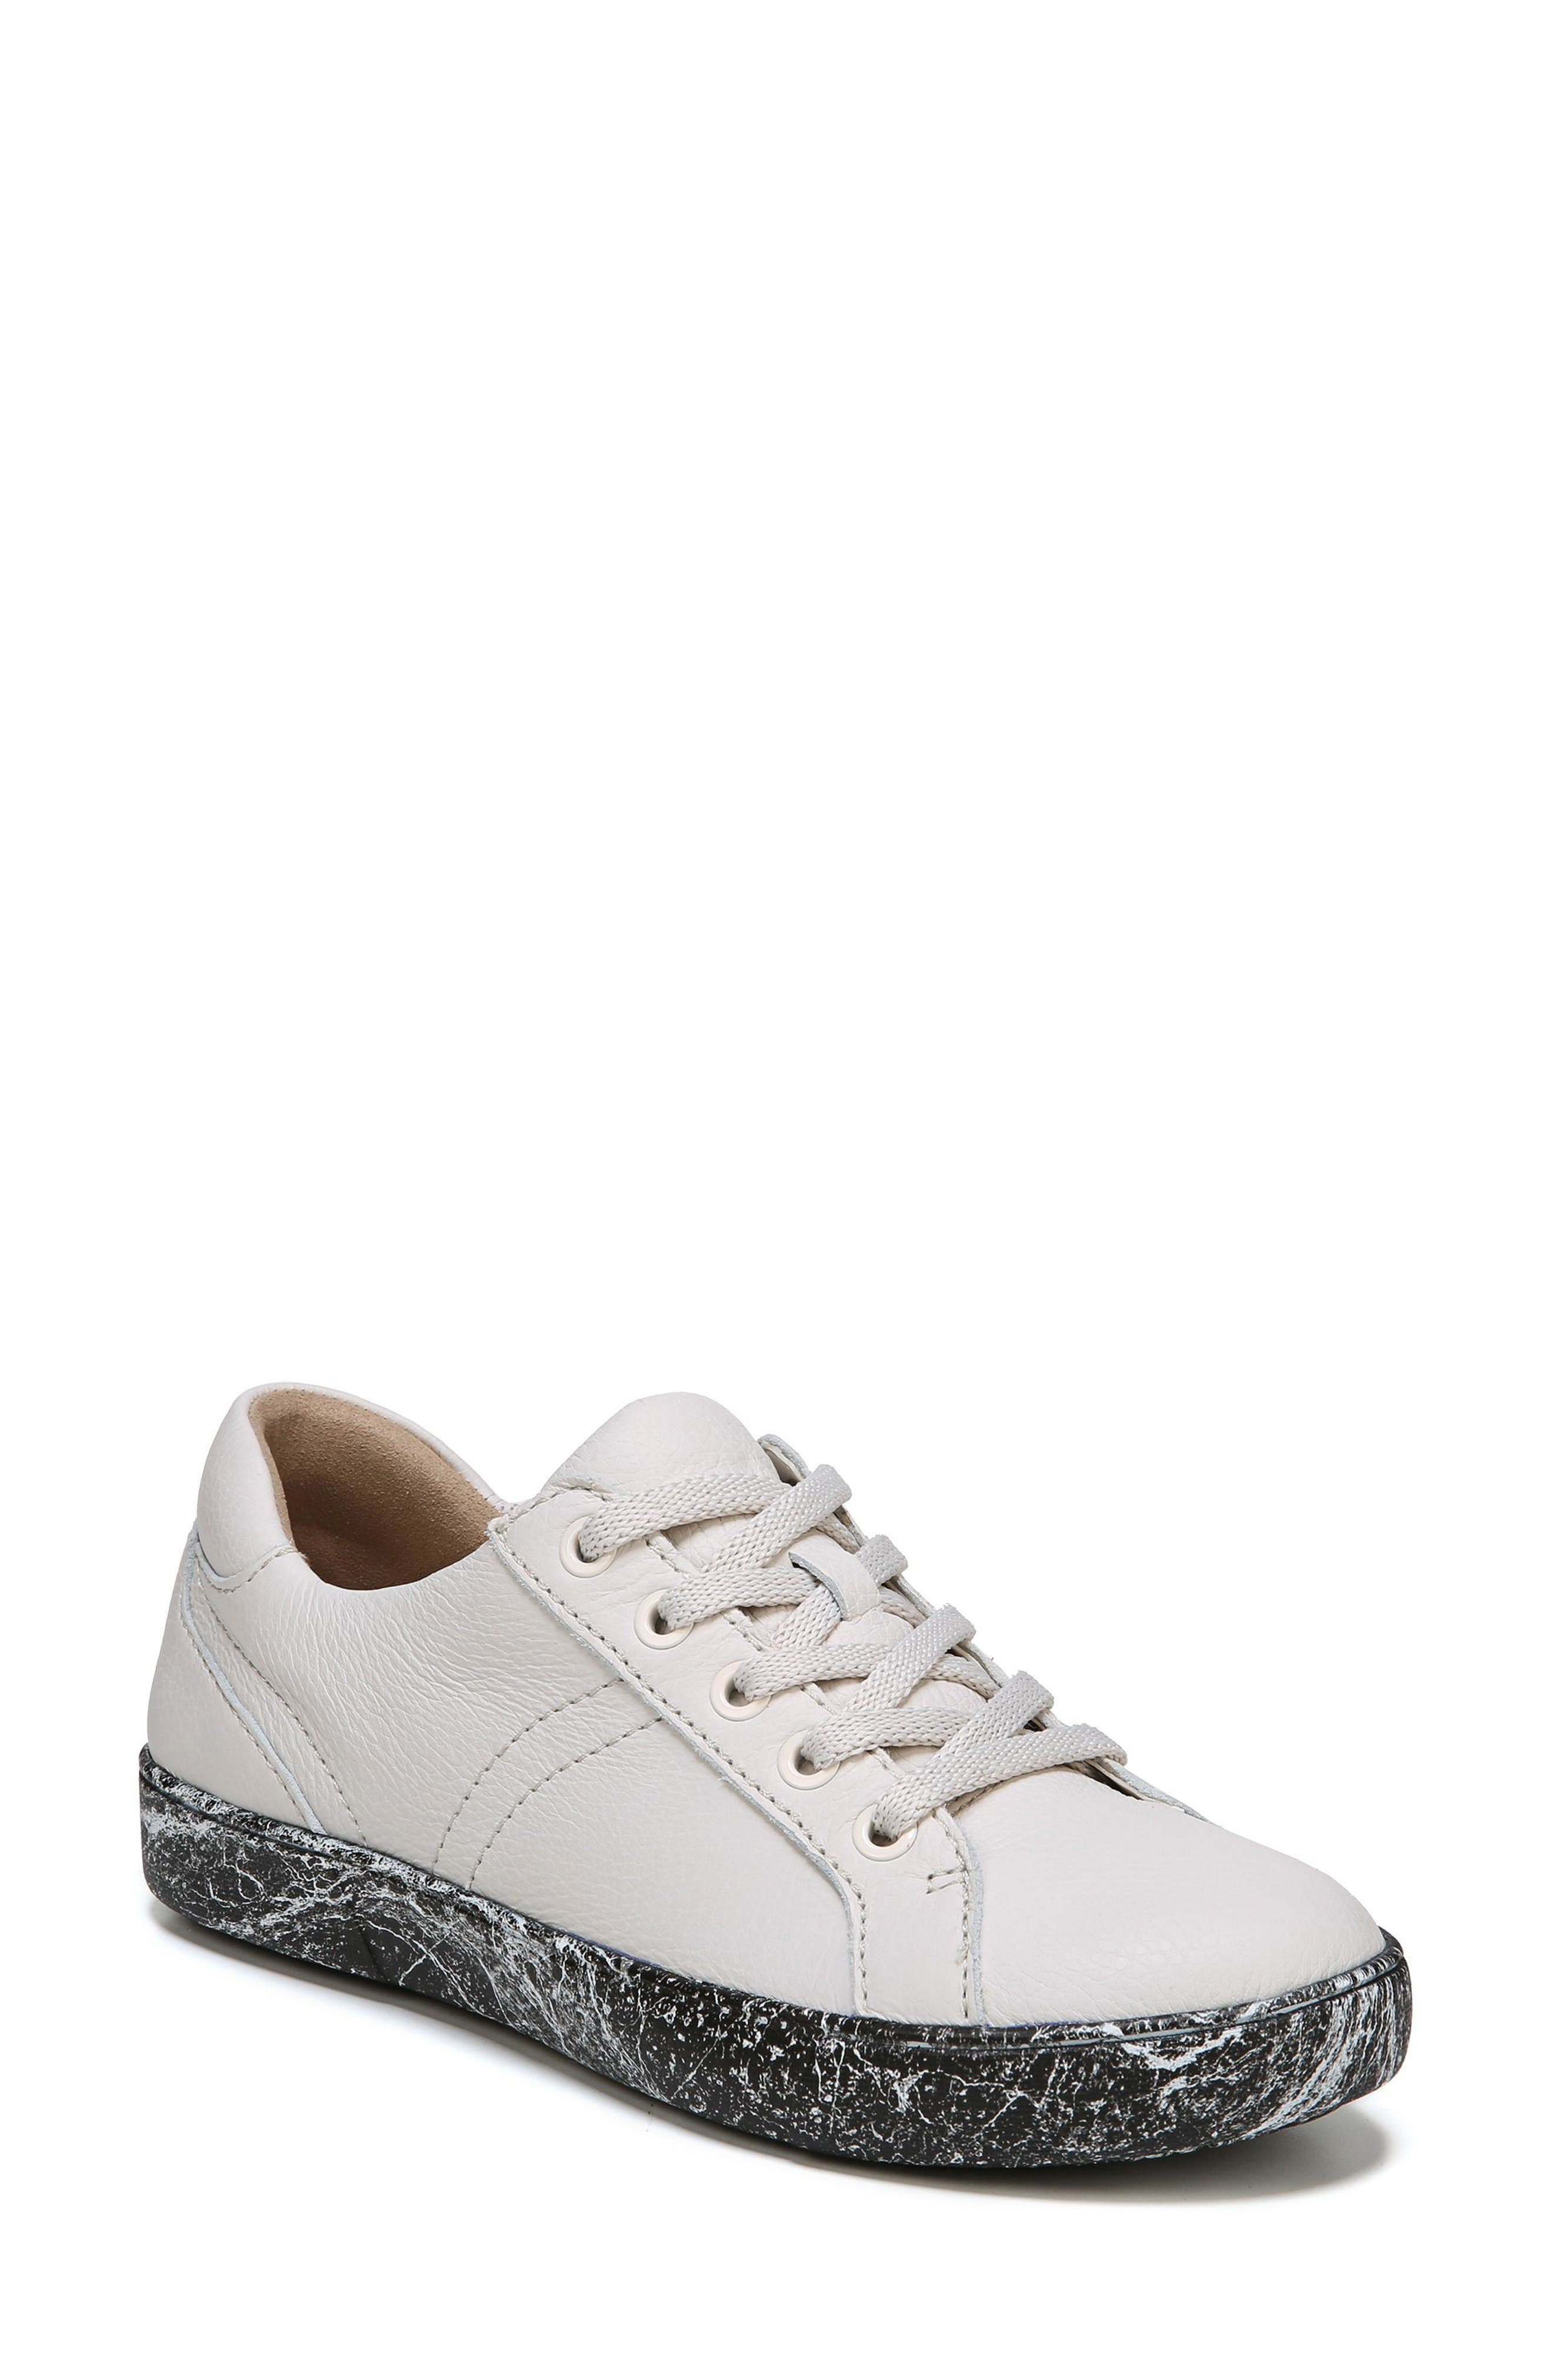 Morrison Sneaker,                             Main thumbnail 1, color,                             Beige Pebble Leather